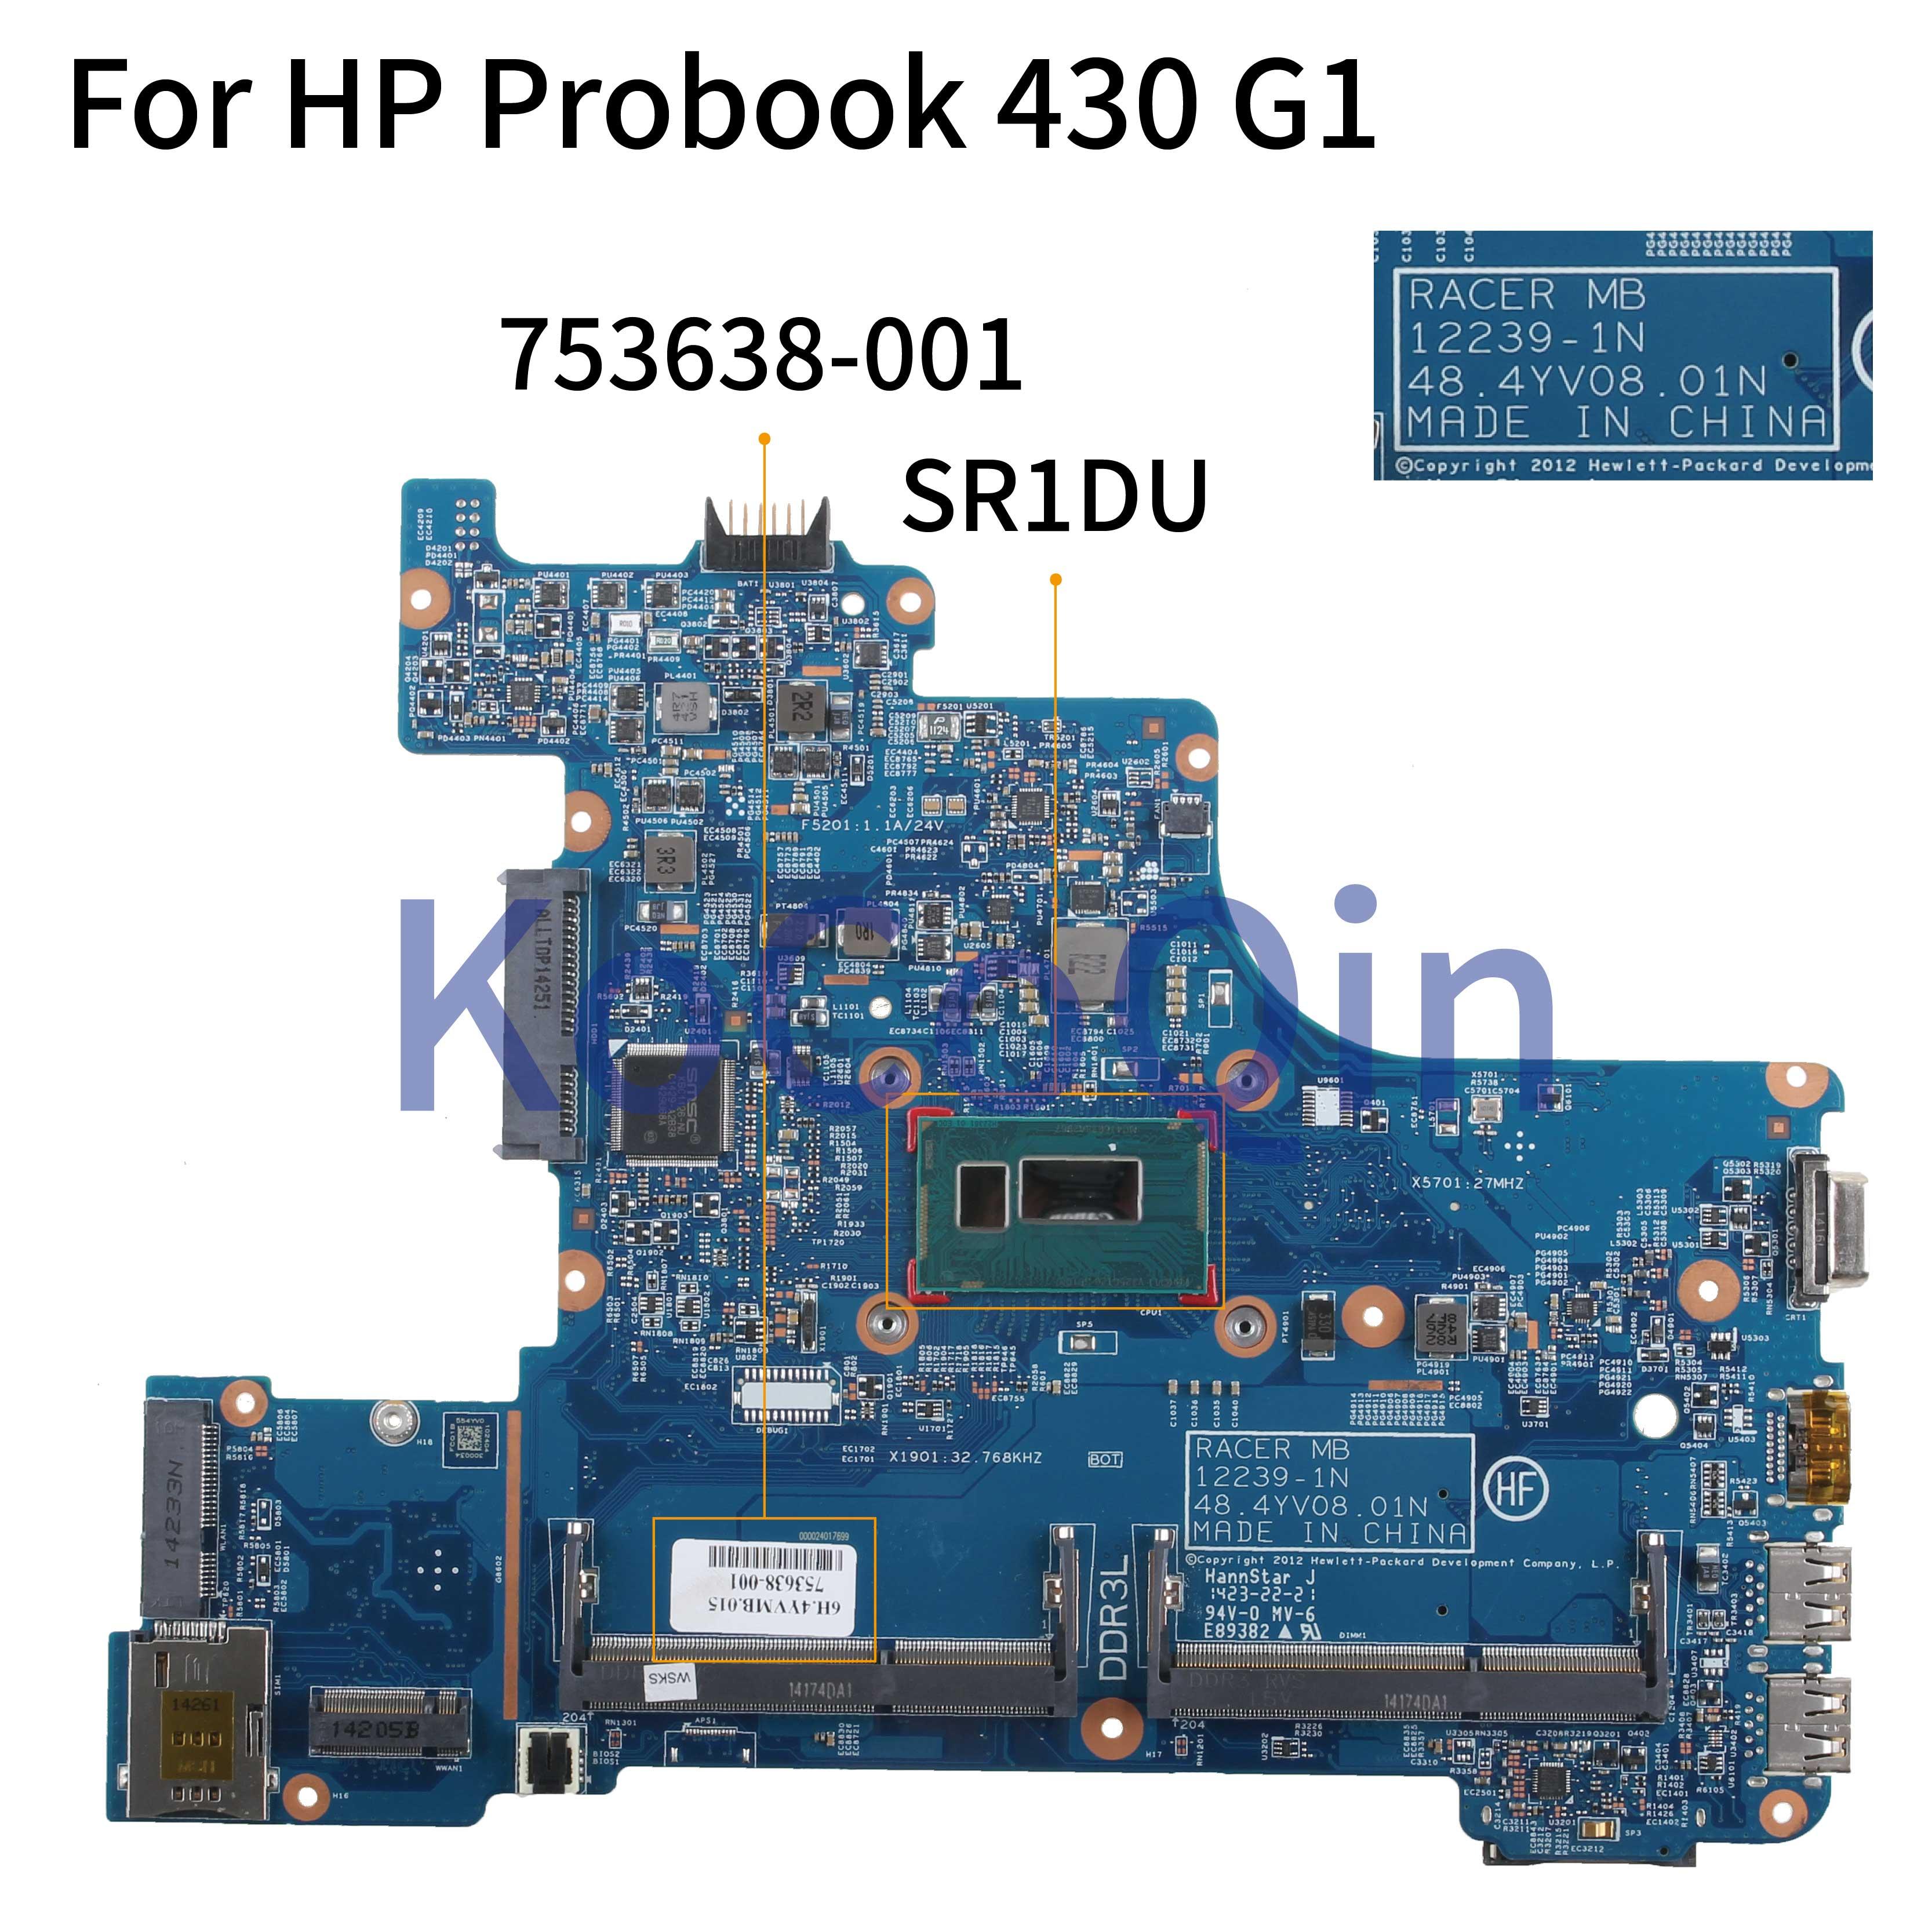 KoCoQin Laptop Motherboard For HP Probook 430 G1 2955U Mainboard 753638-001 753638-501 SR1DU 12239-1N 48.4YV08.01N